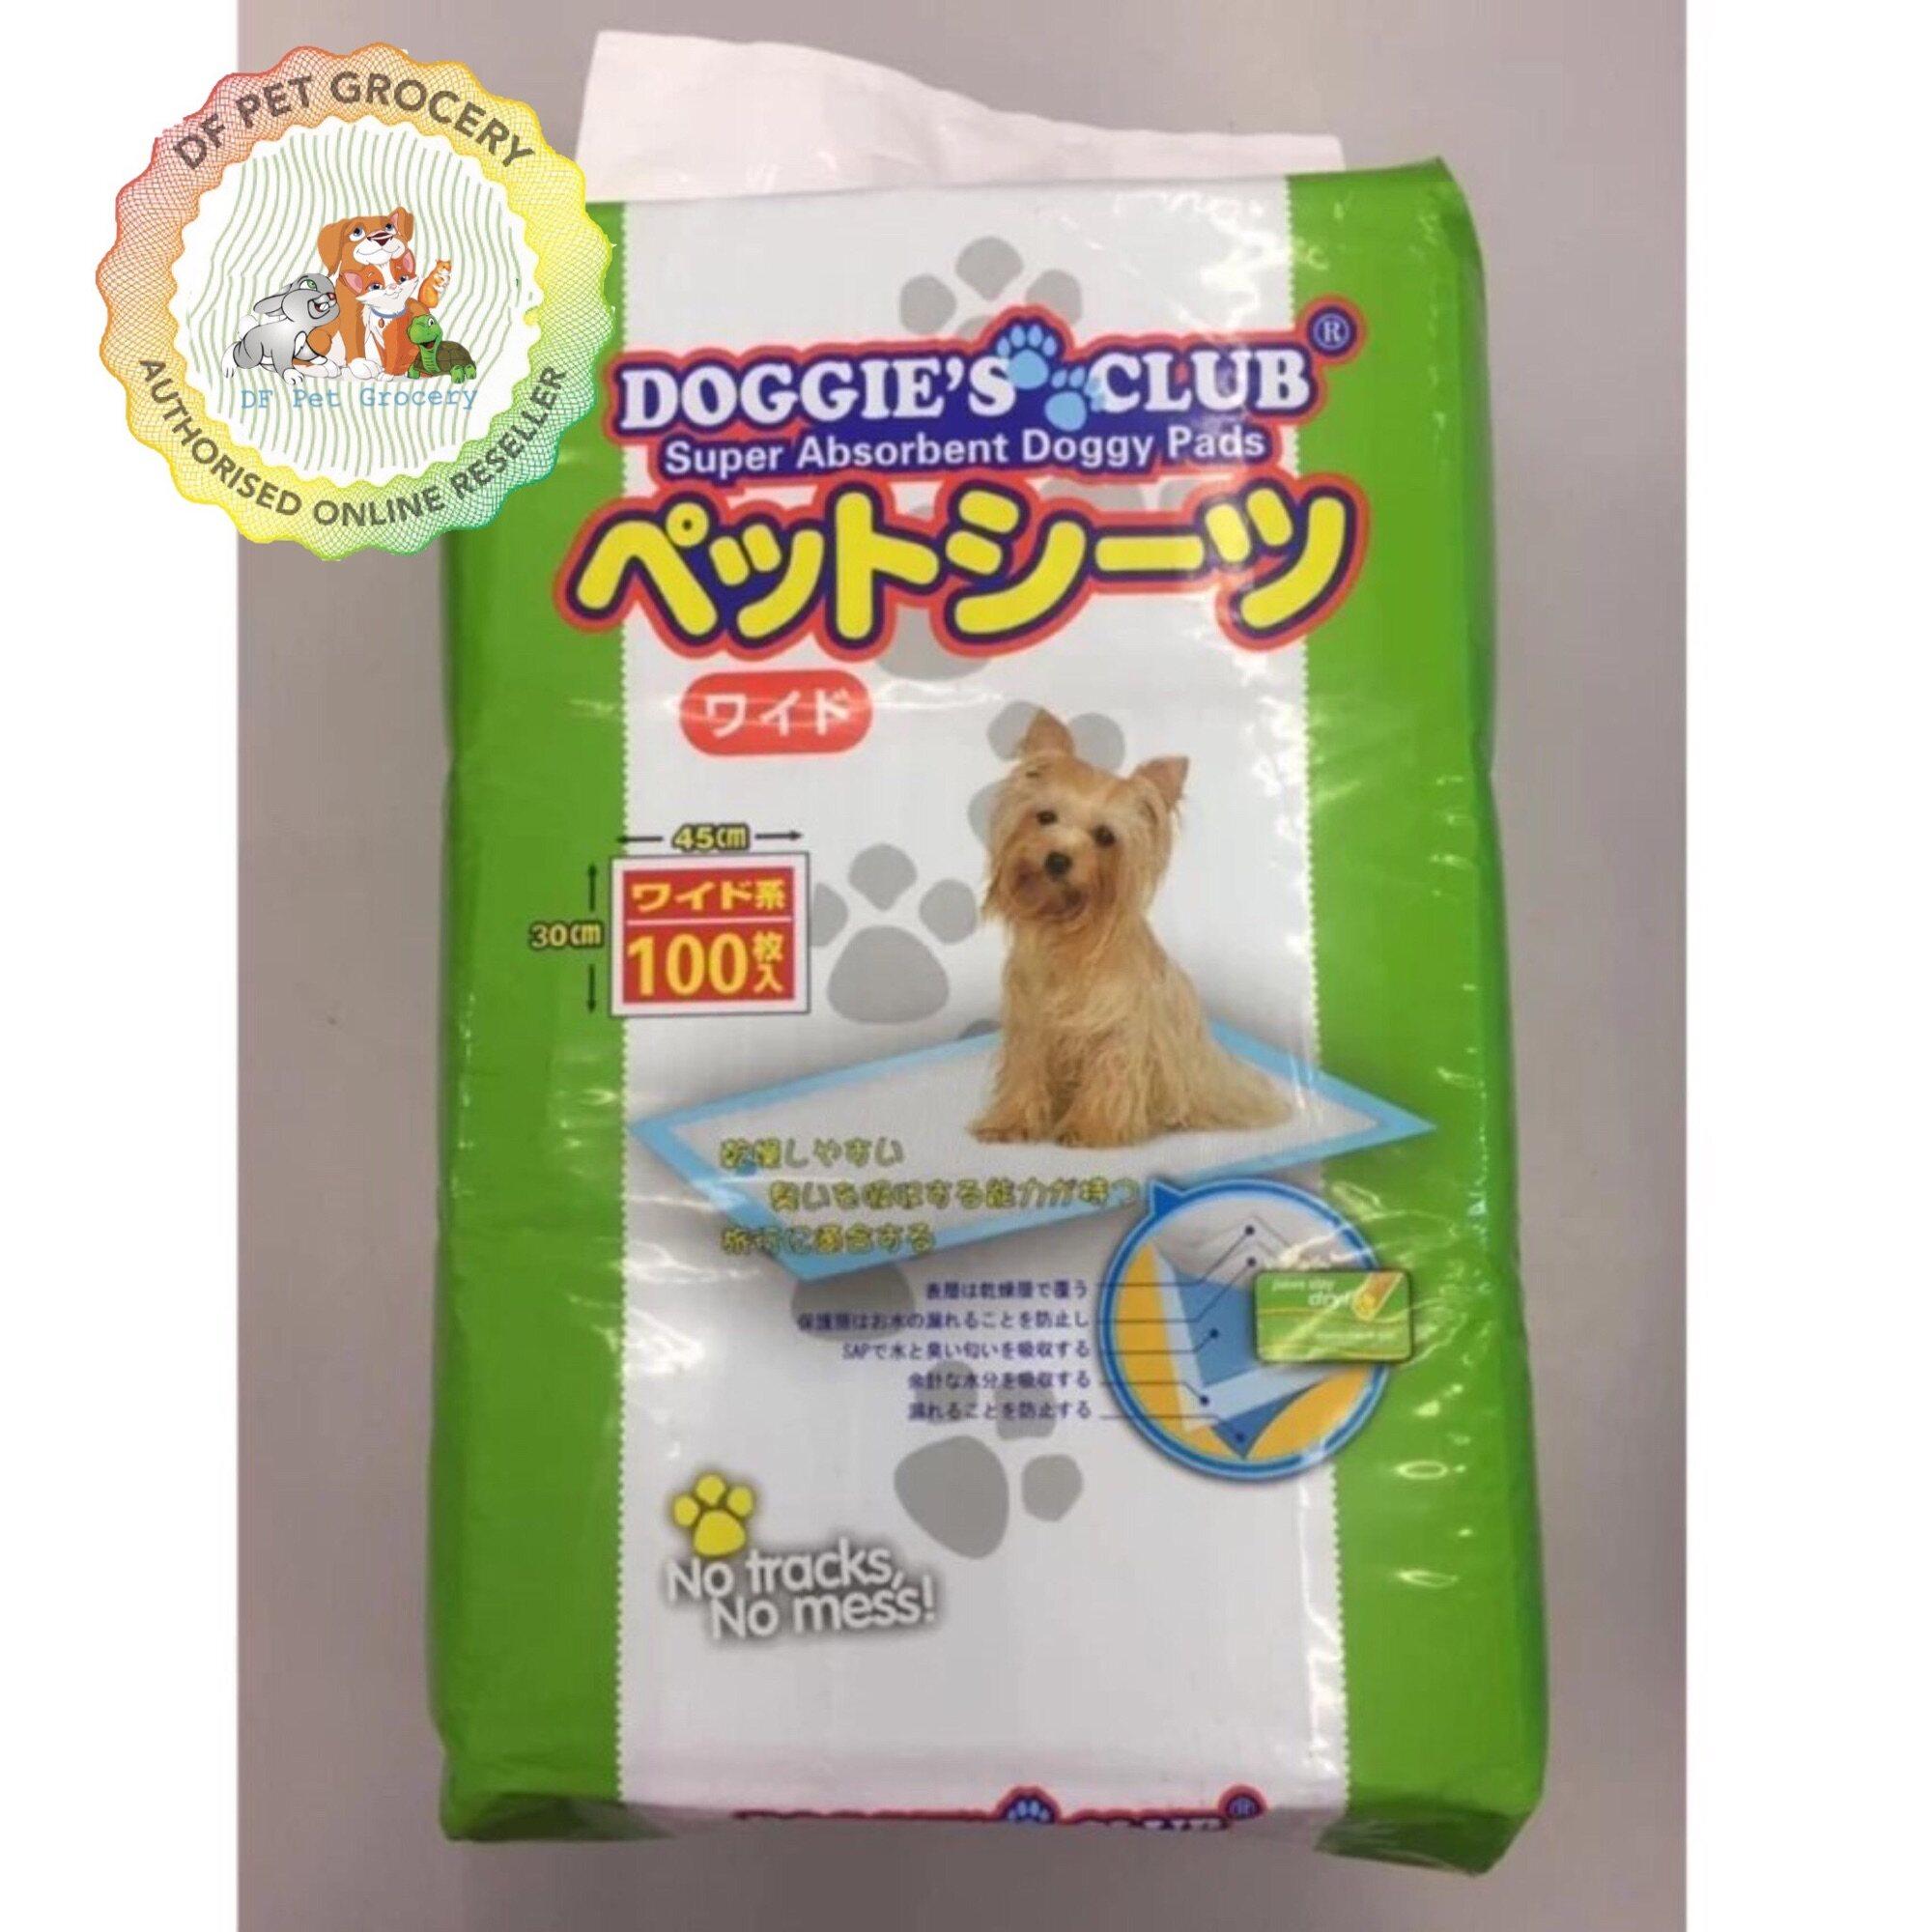 Doggies Club Super Absorbent Doggy Pads 100 Pcs(45cmx30cm)